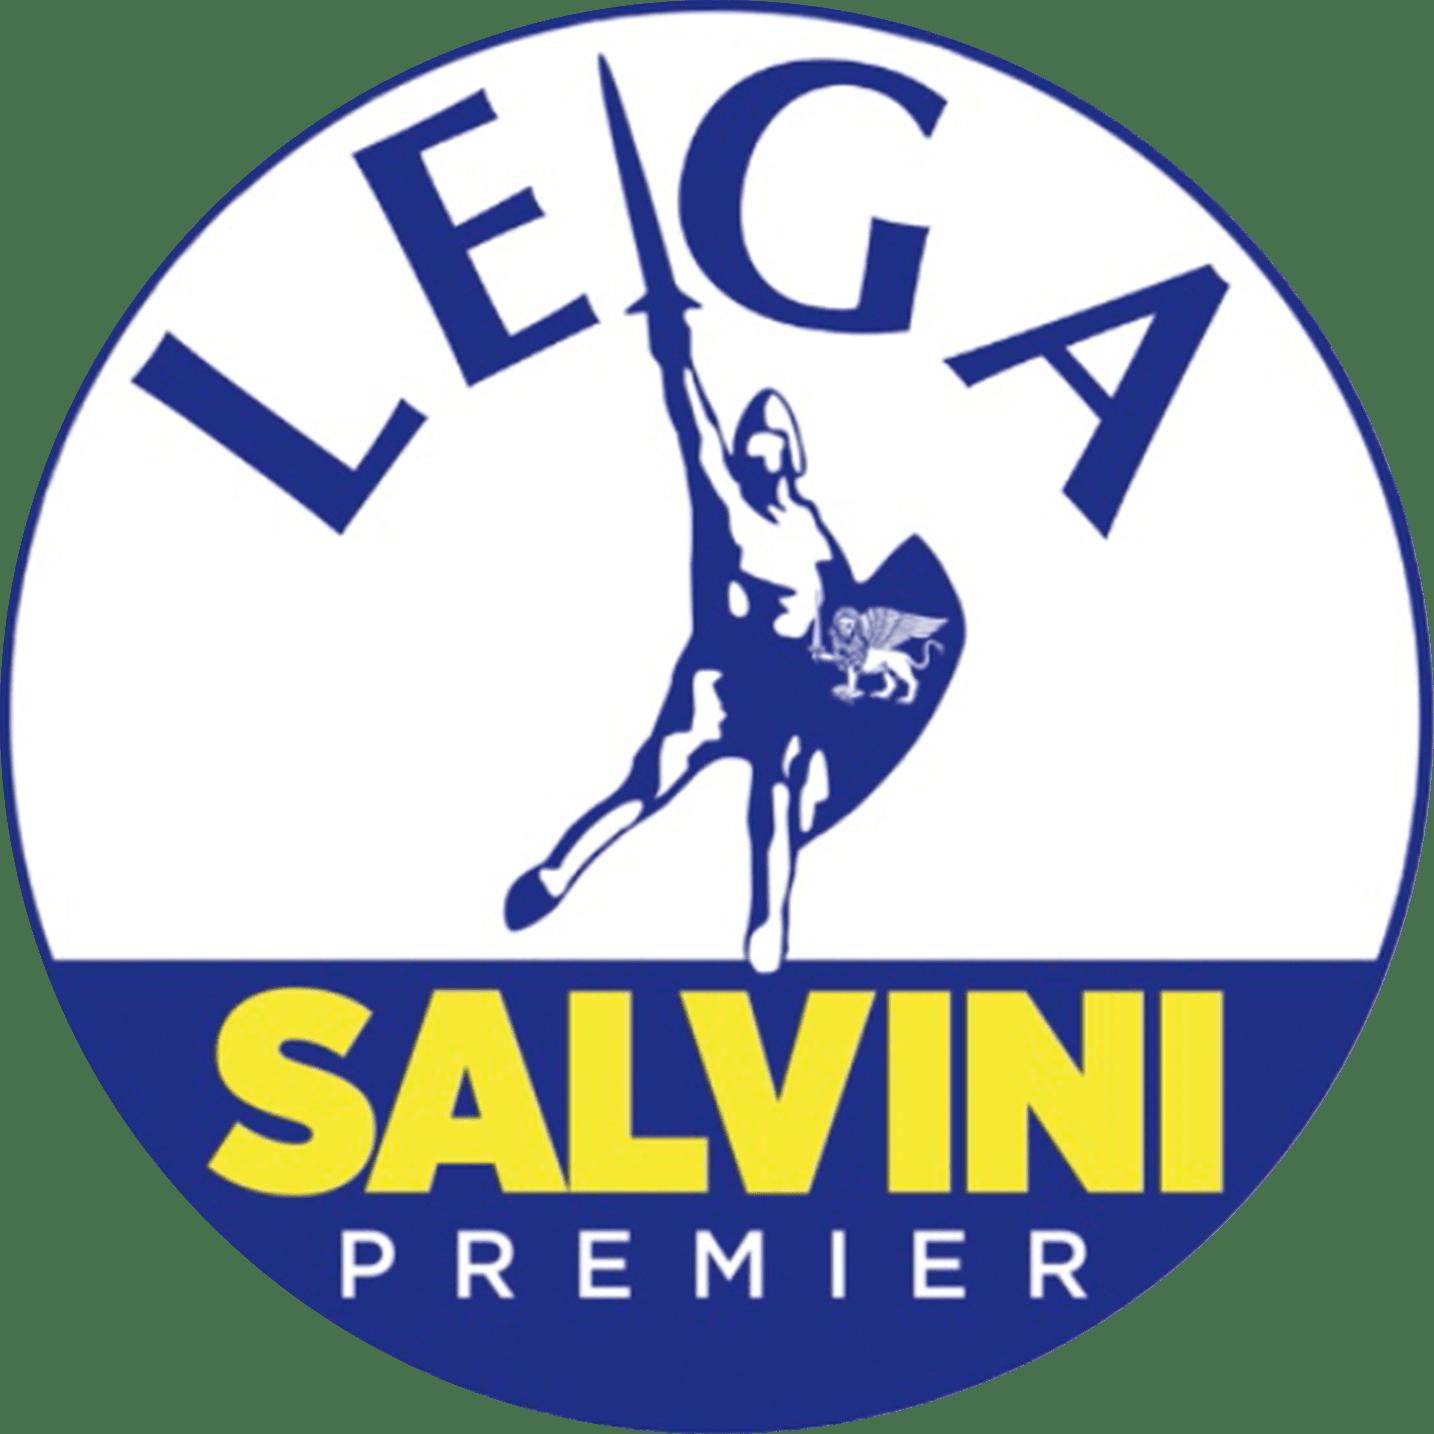 Lega Salvini PREMIER